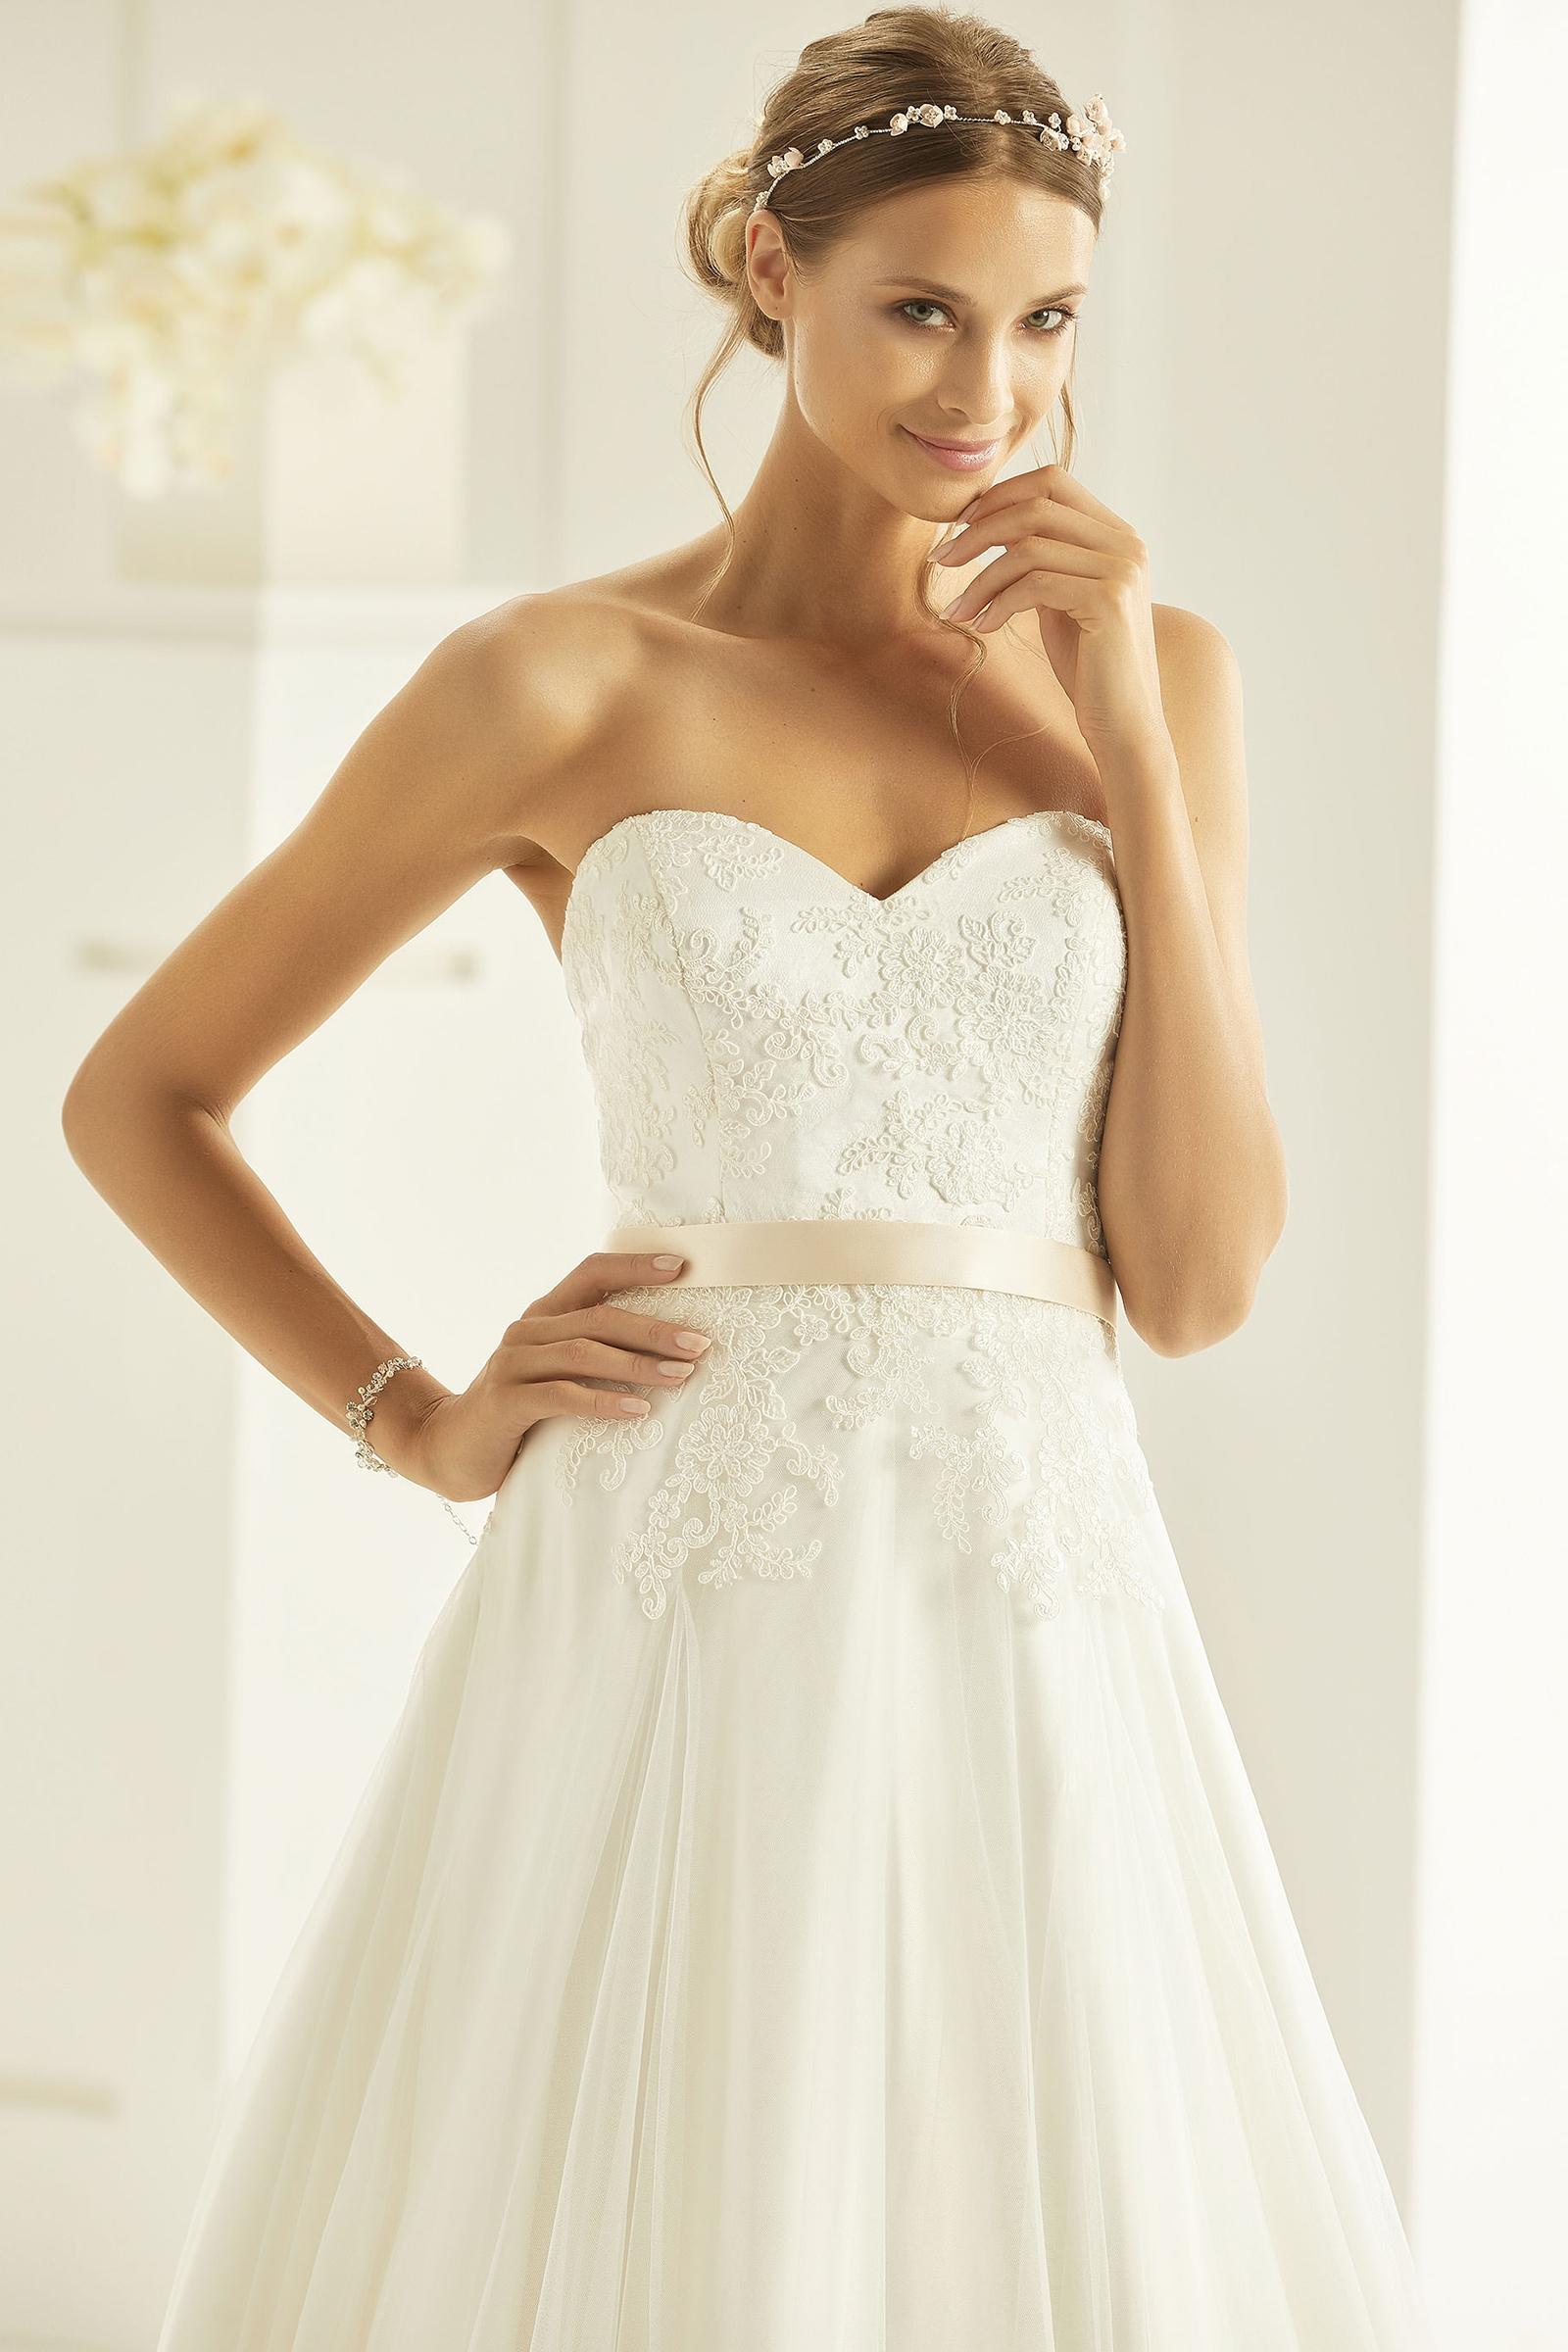 d64753ea1435 Νυφικό «Pinelope» - Νυφικά Θρησκευτικού Γάμου